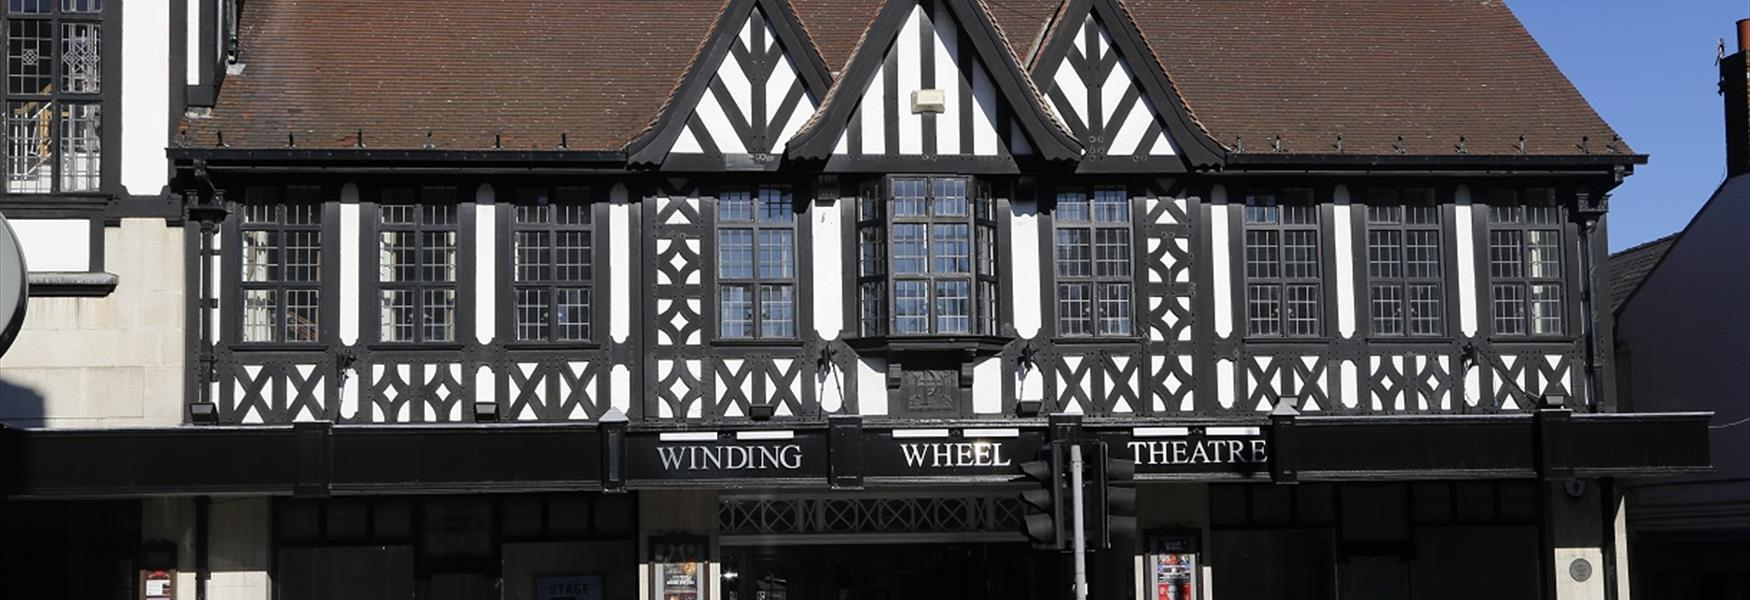 Winding Wheel Theatre, Chesterfield